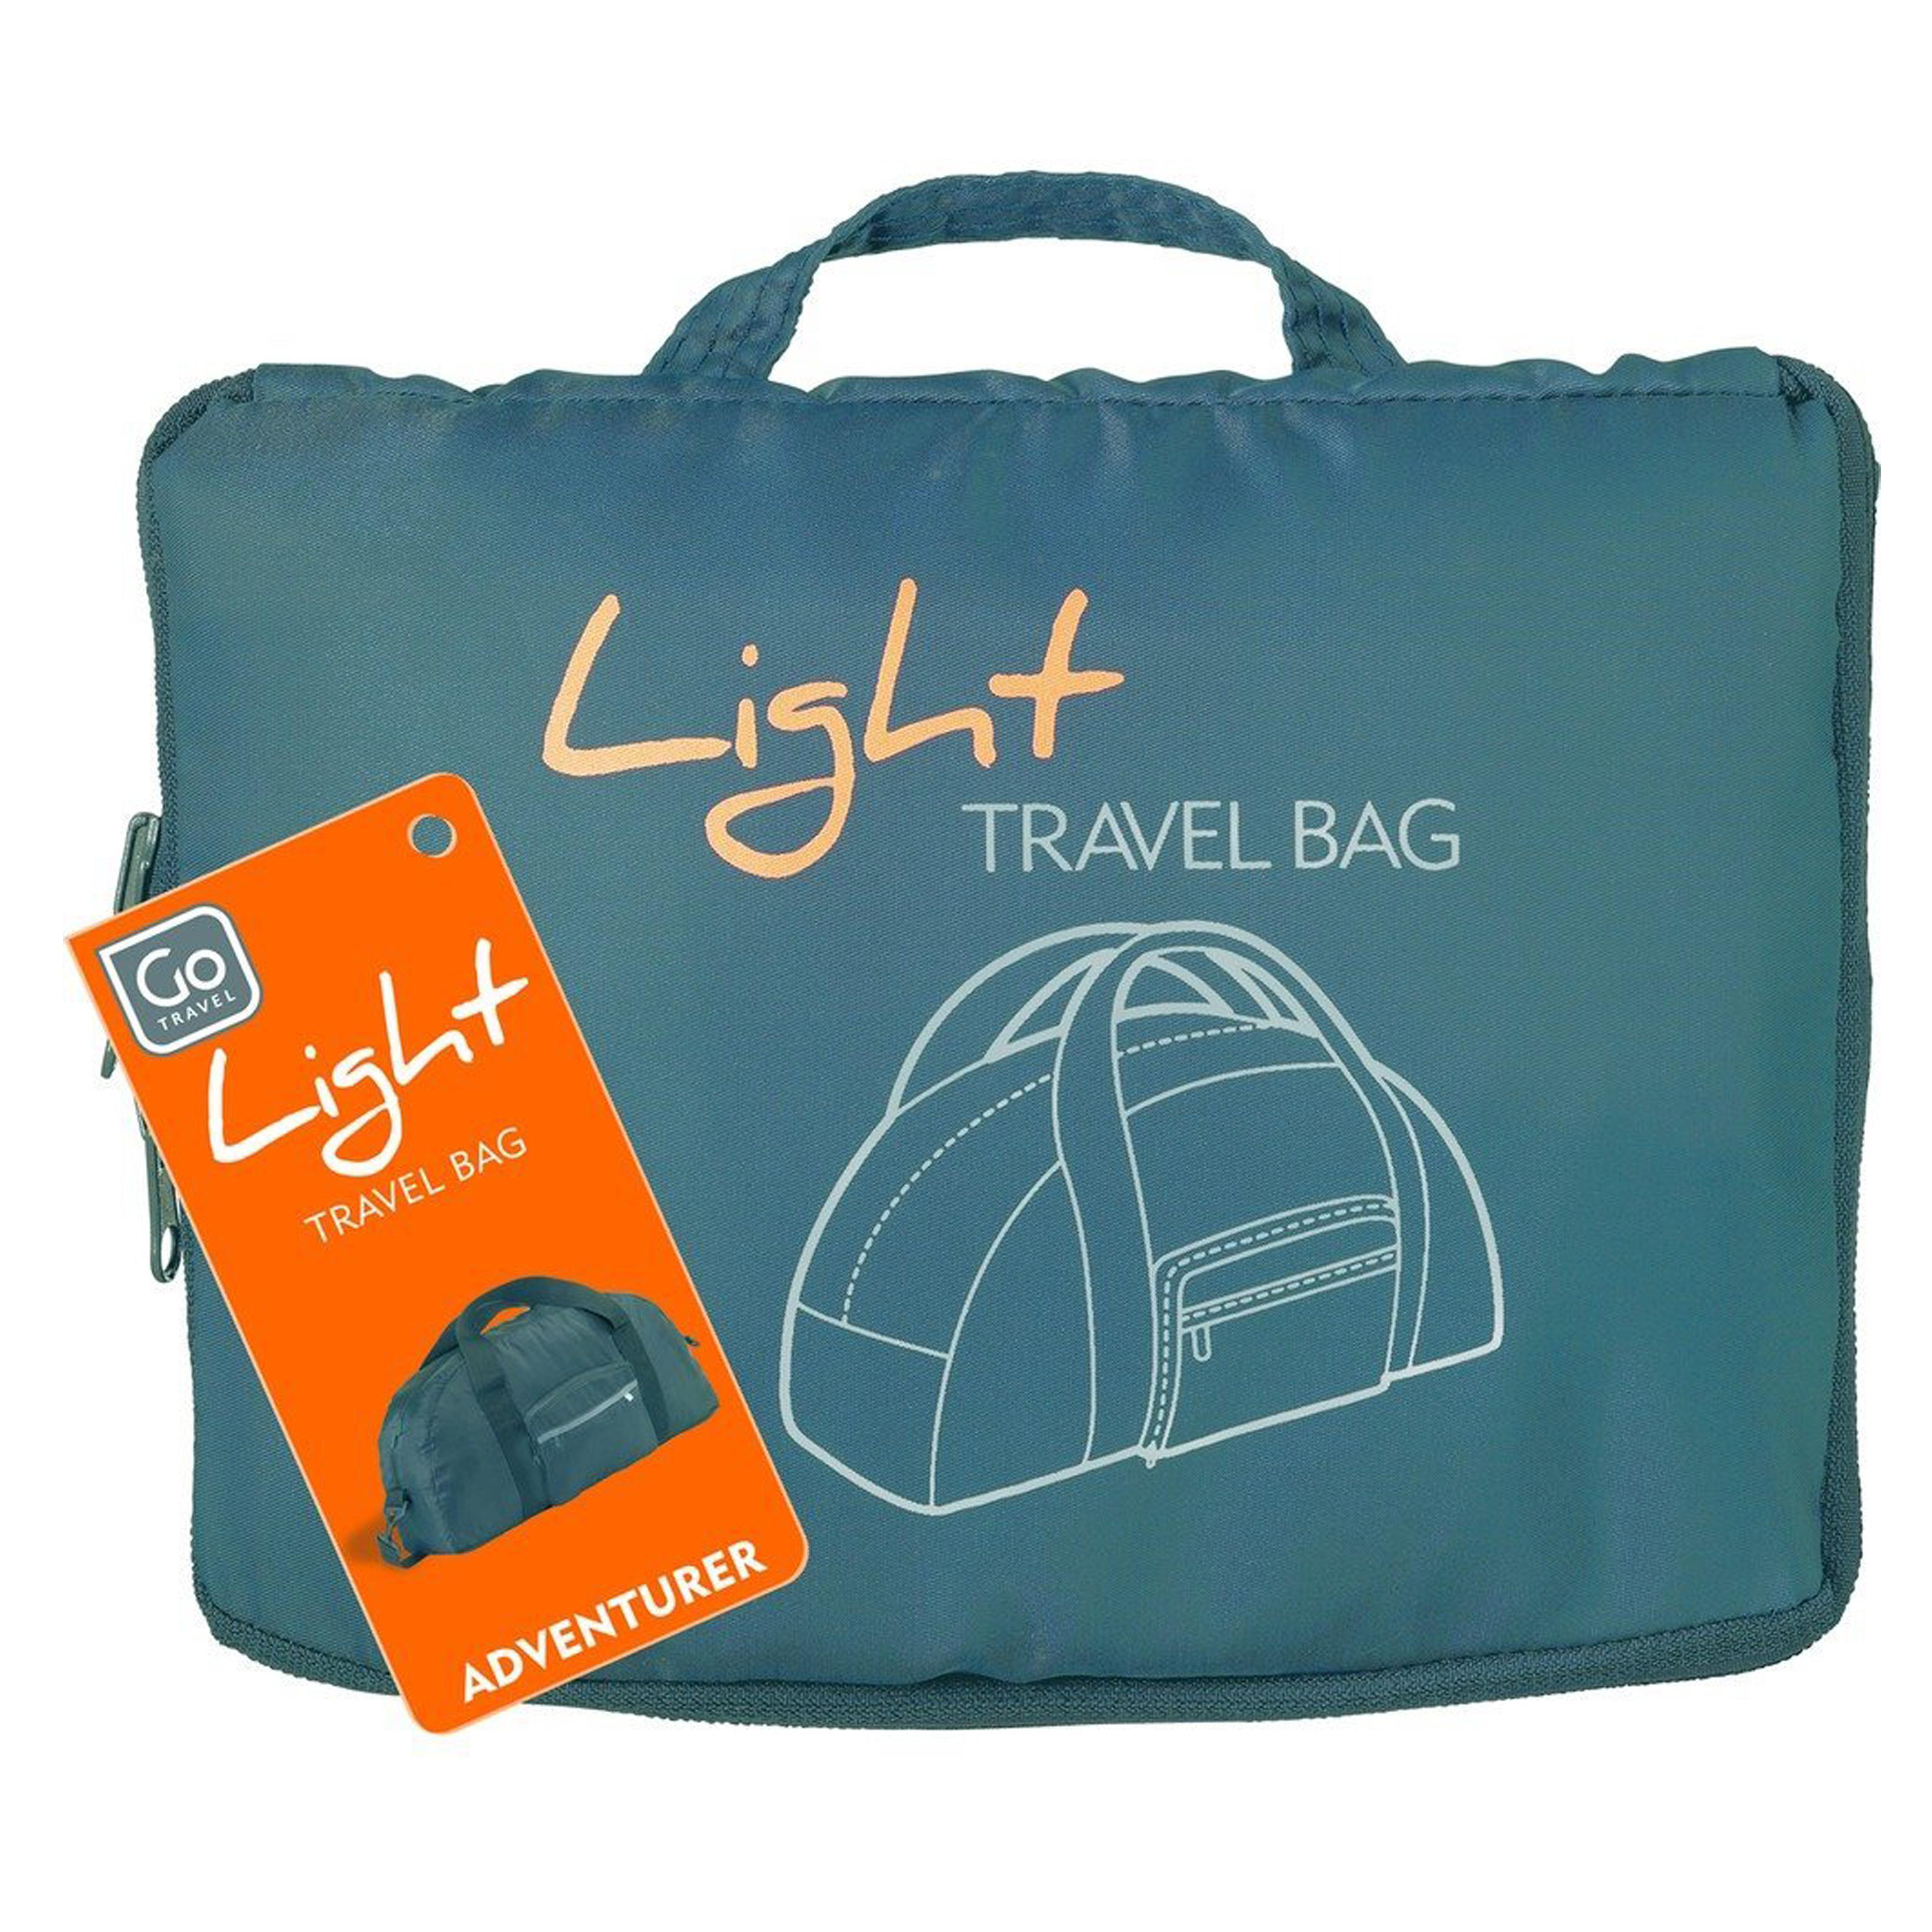 Go Travel 510 Navy Blue Lightweight Travel Bag Luggage